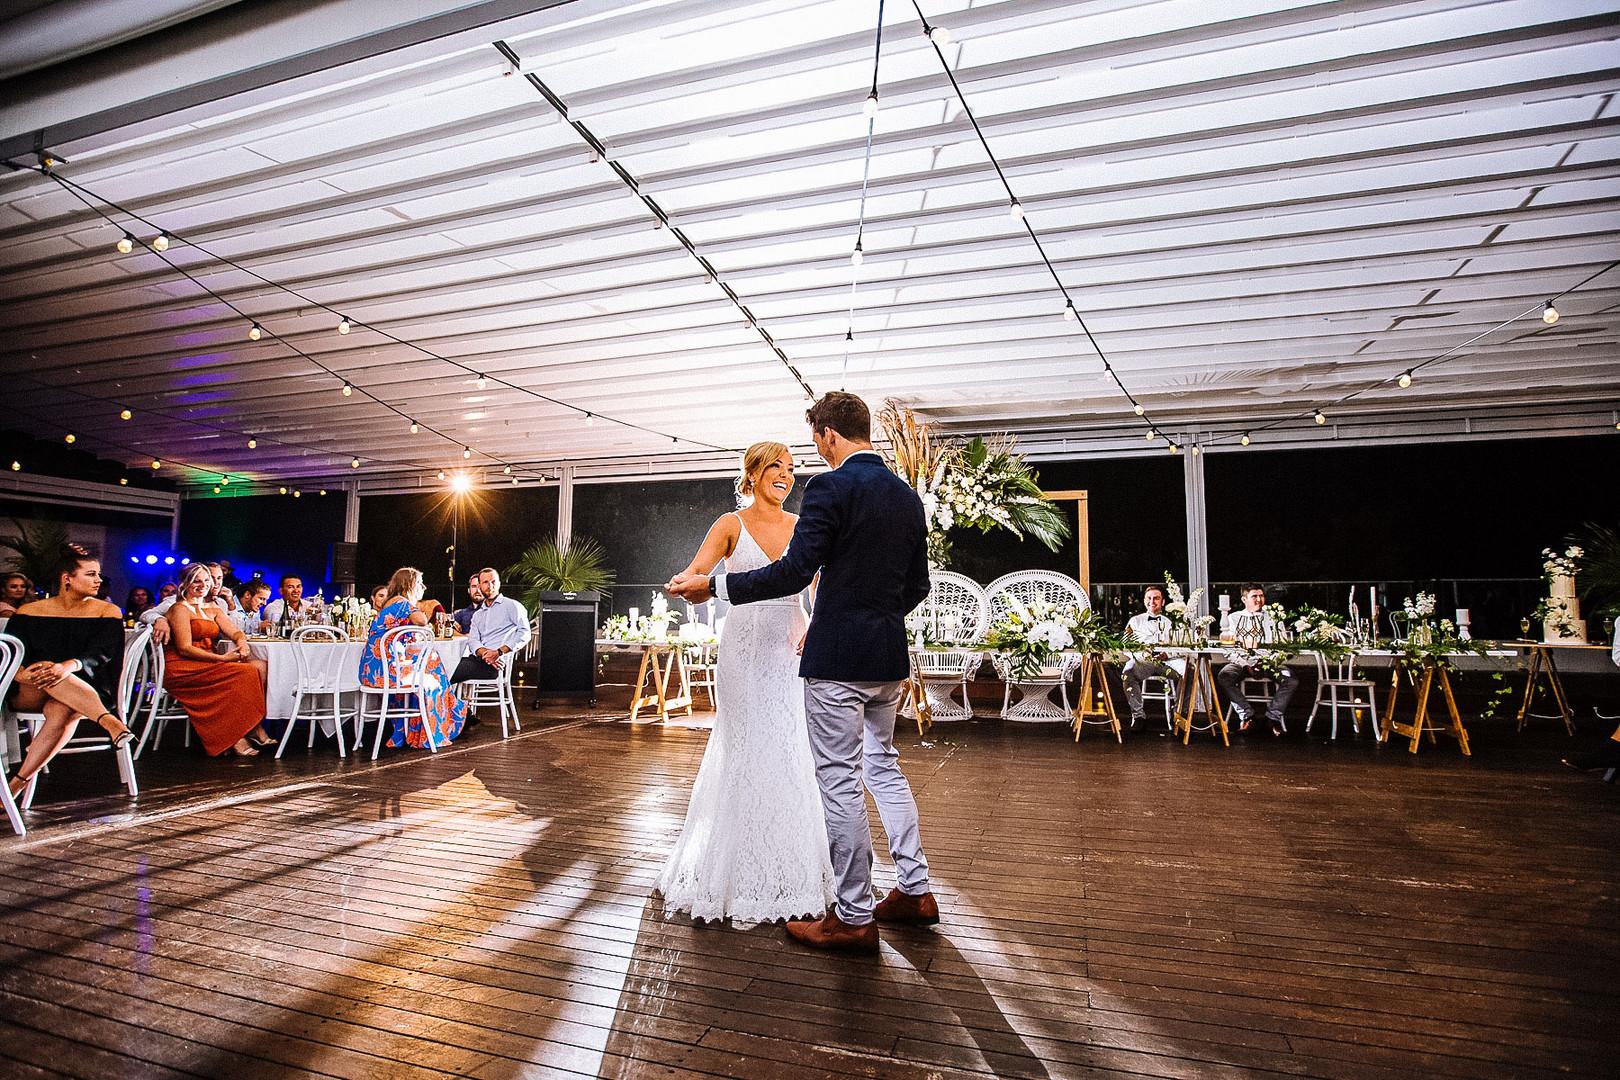 WeddingWebsite_Compressed-47.jpg